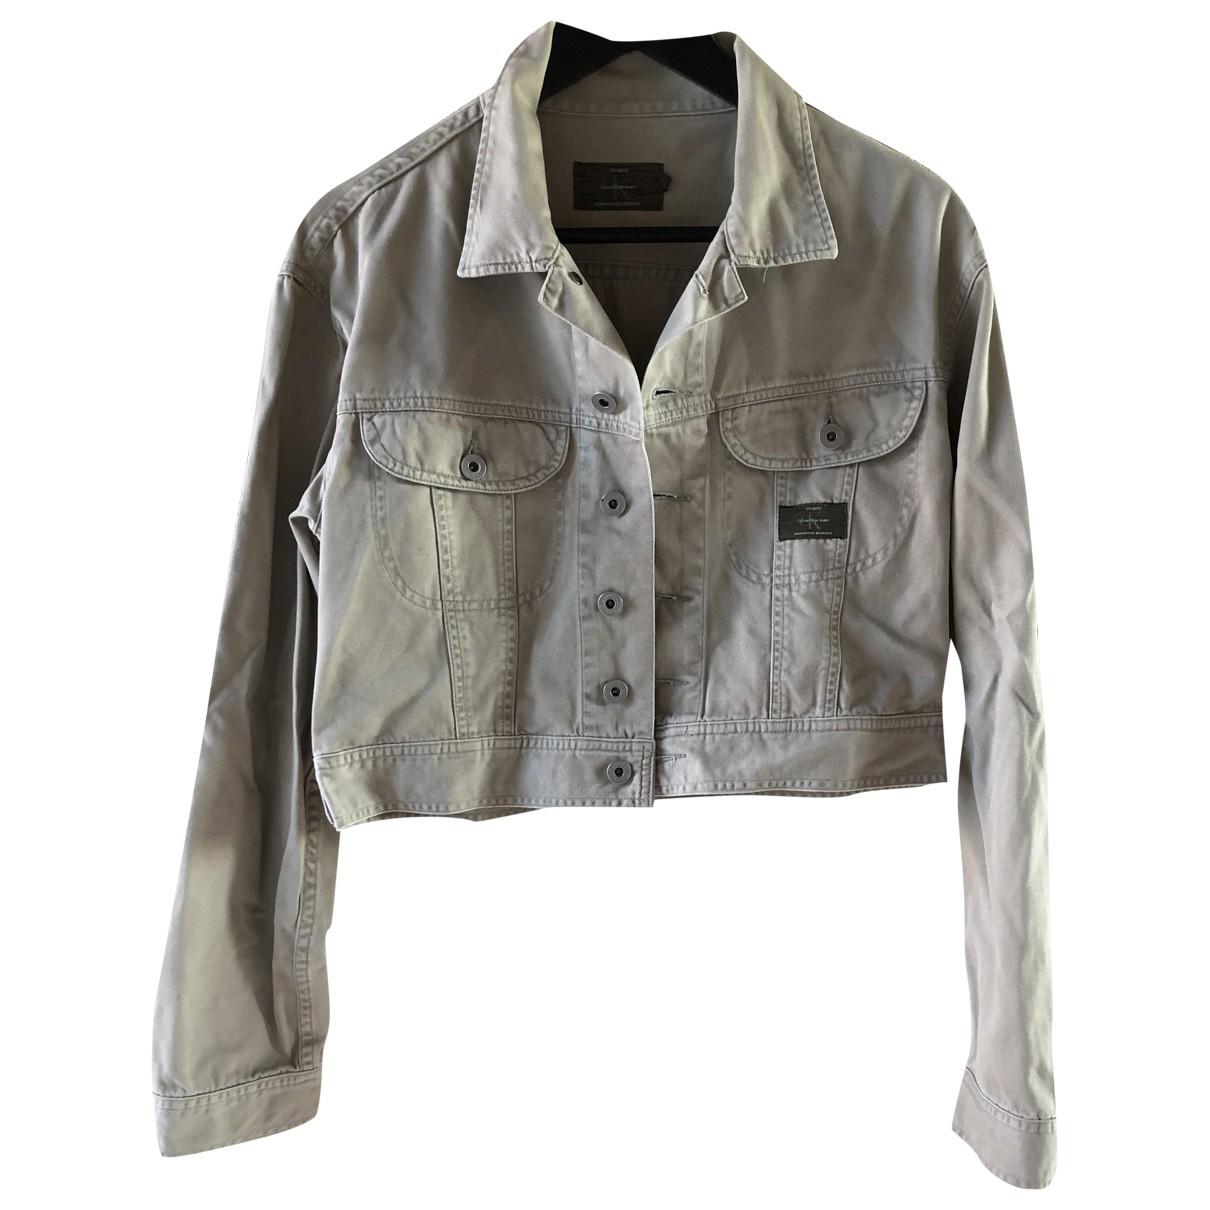 Calvin Klein \N Khaki Denim - Jeans jacket for Women M International